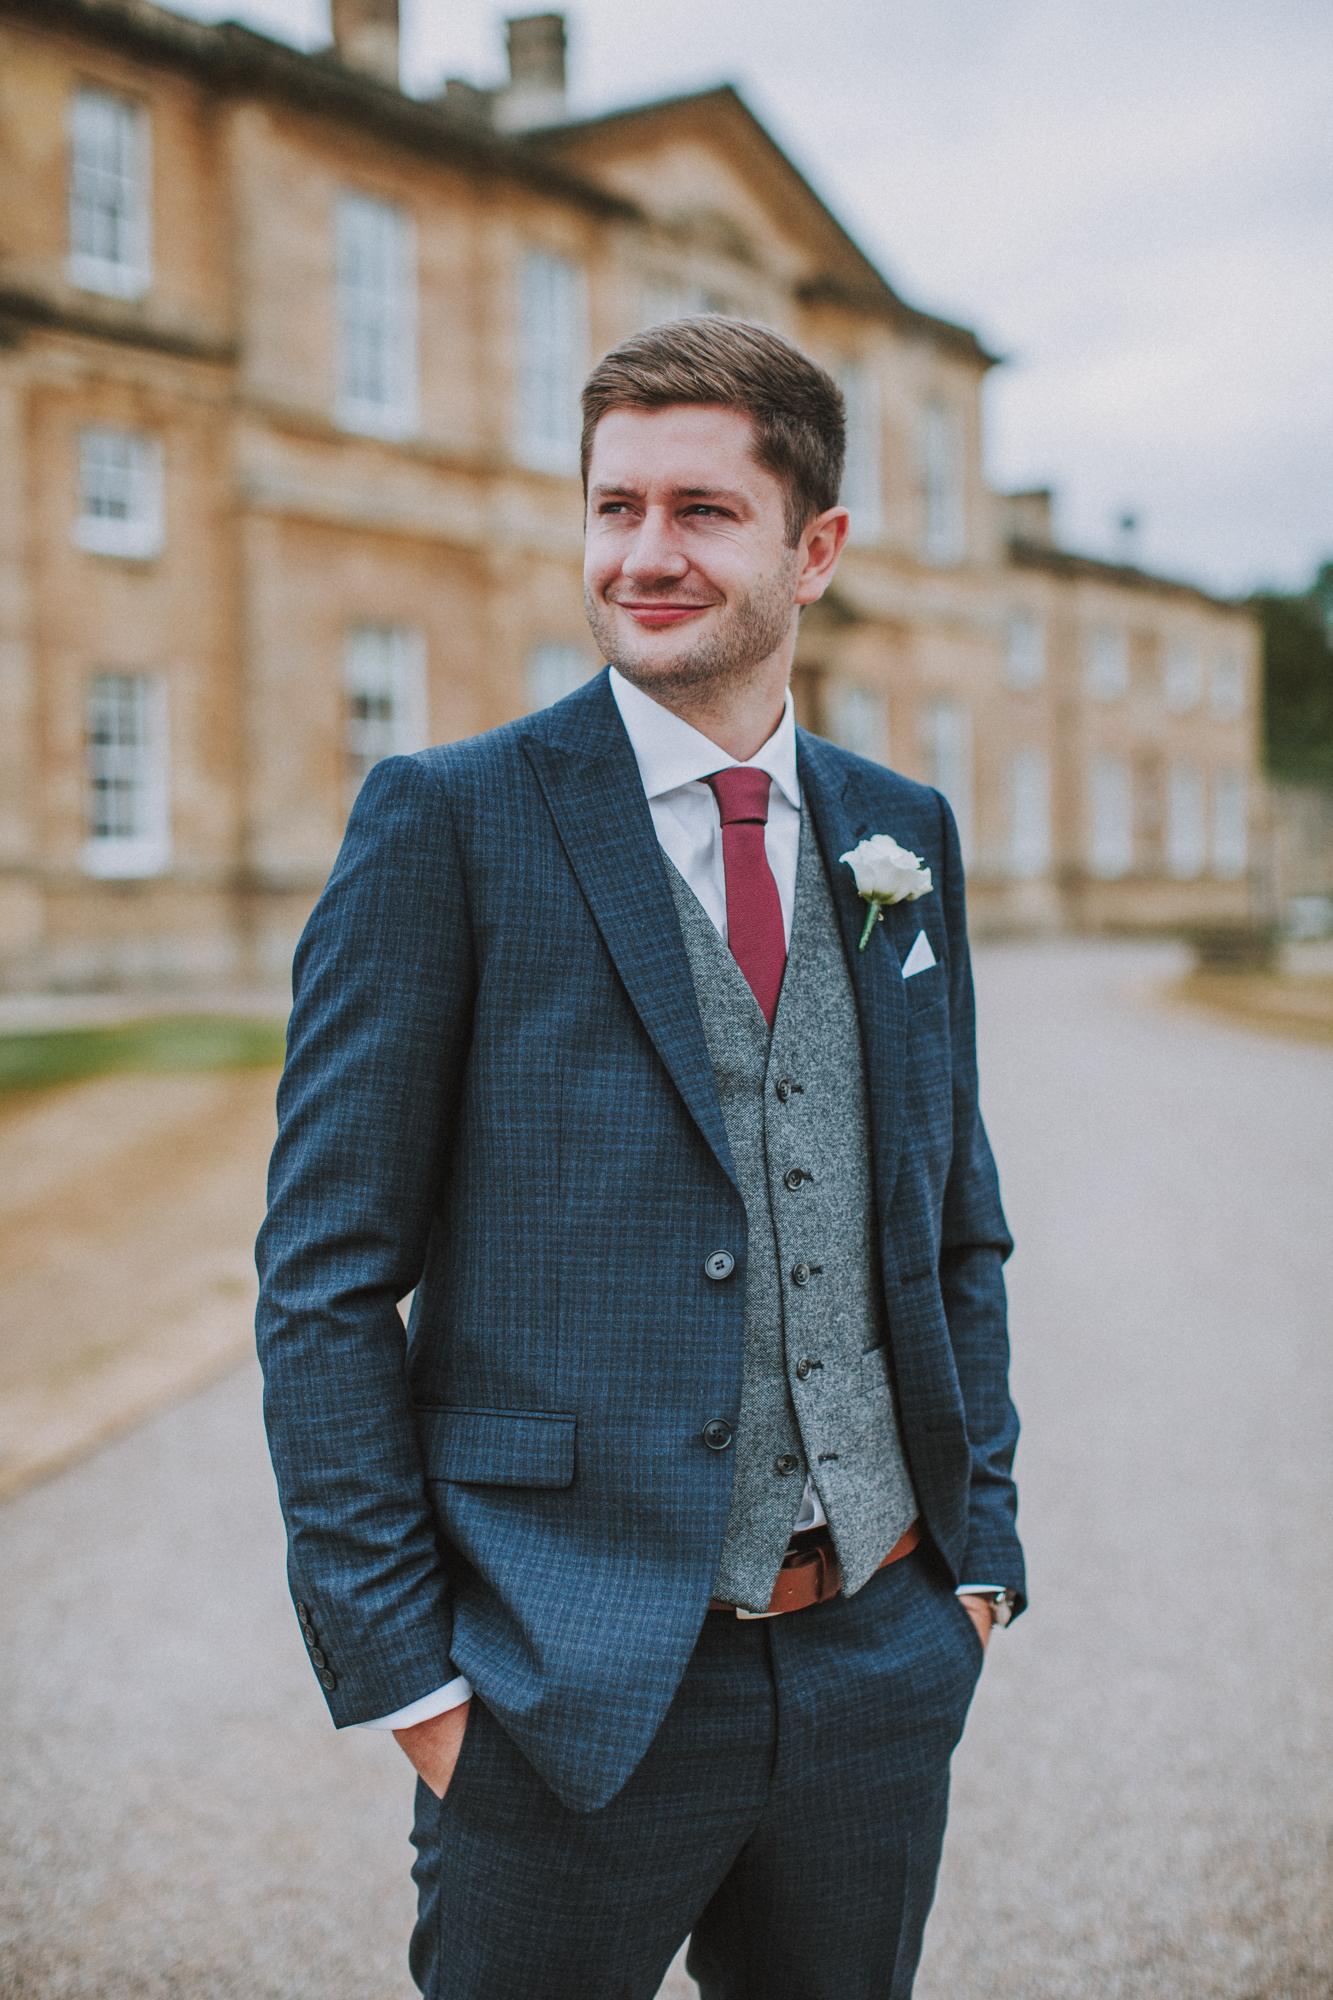 bowcliffe hall wedding photographers yorkshire-16.jpg